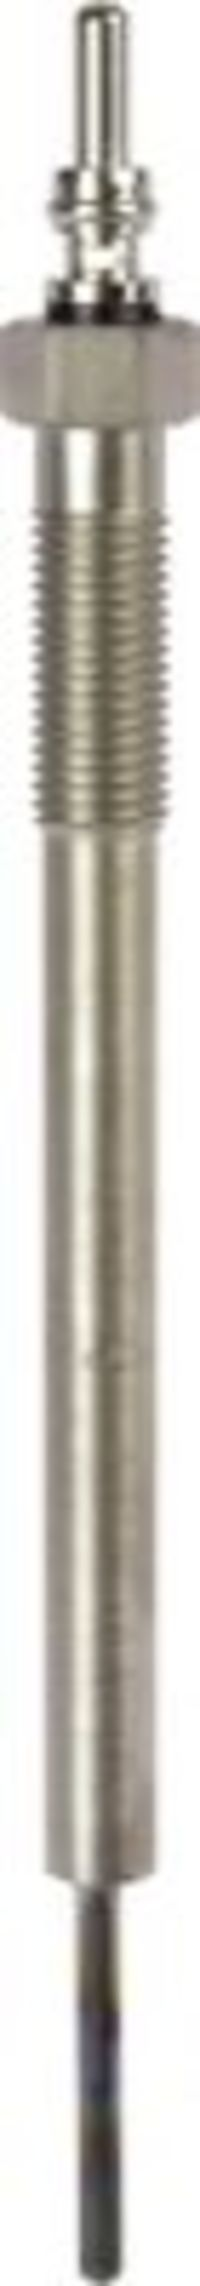 Свеча накаливания HERTH+BUSS JAKOPARTS J5713015